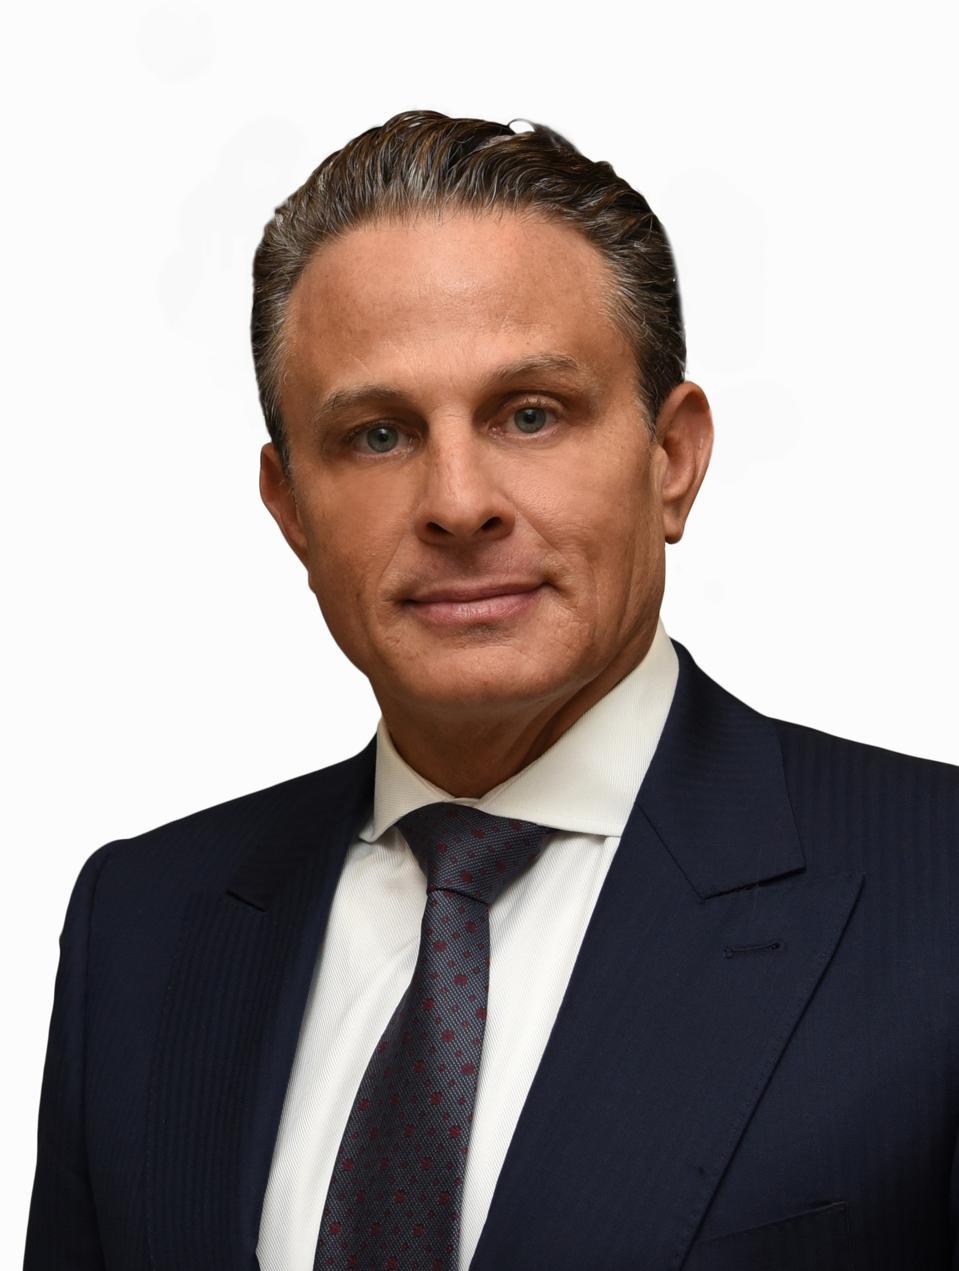 Jeffrey Fratarcangeli Managing Principal, Fratarcangeli Wealth Management